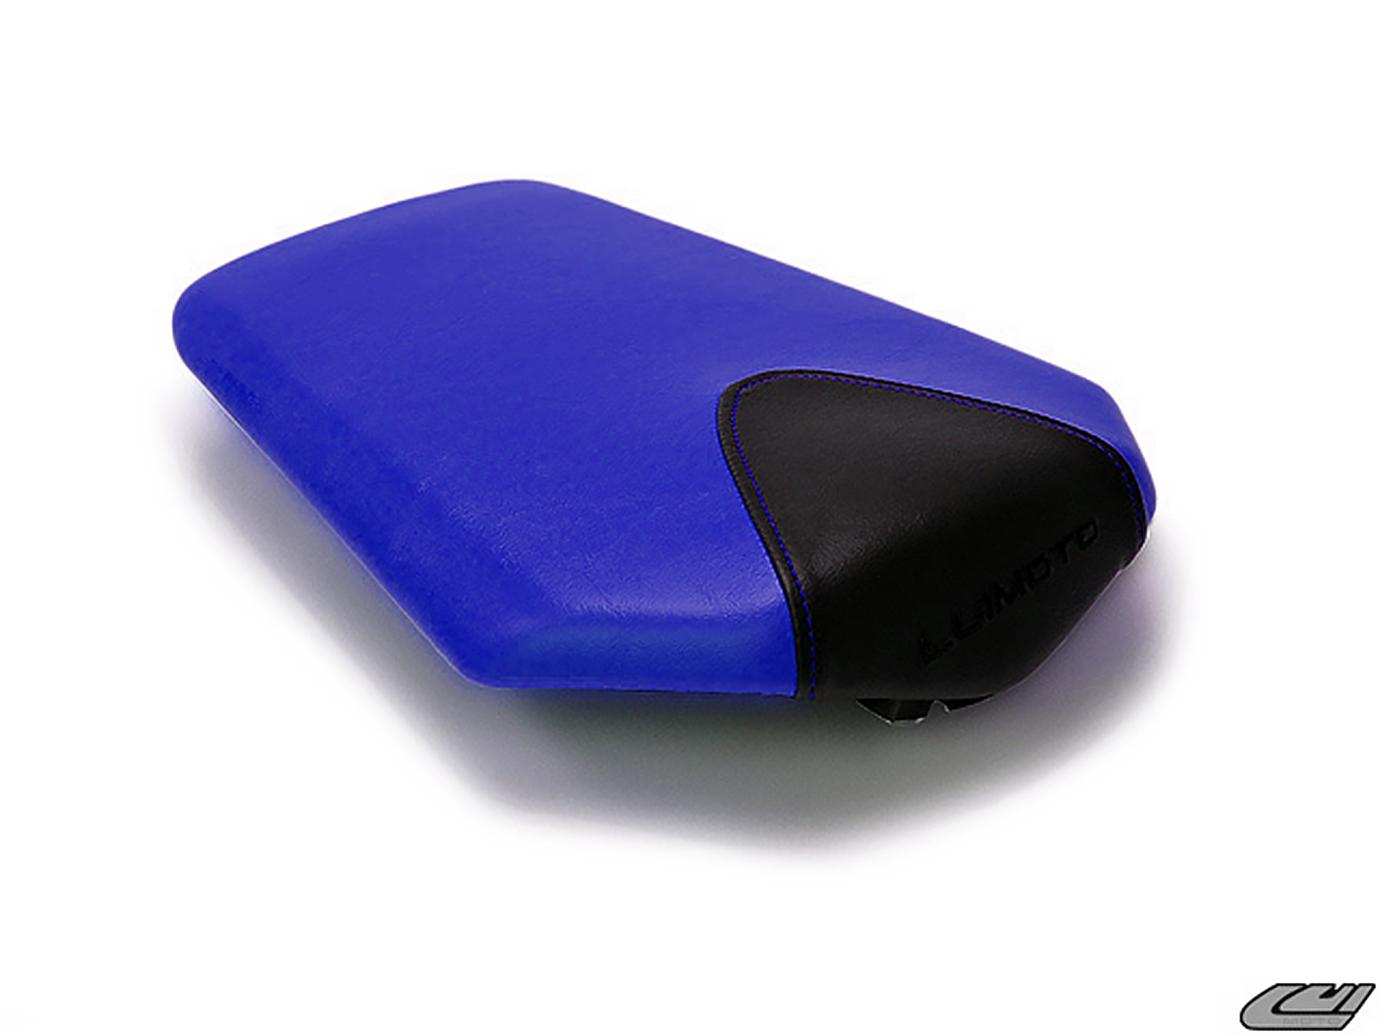 HONDA CBR1000RR 08-11 LUIMOTO 製タンデムシートカバー (Baseline 2111208)